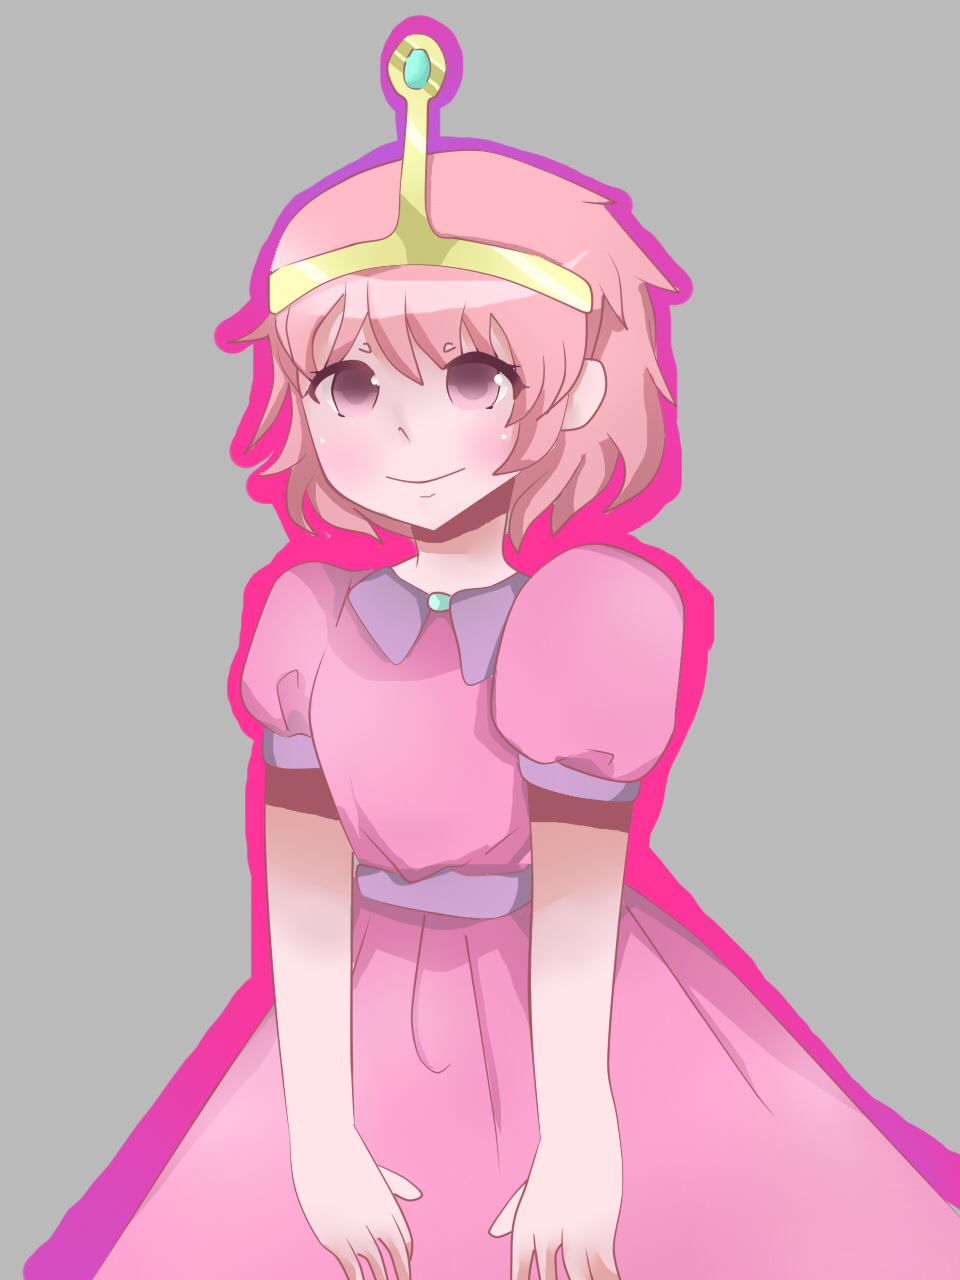 Princess Bonnibel Bubblegum - Adventure Time - Image ...  Princess Bonnib...